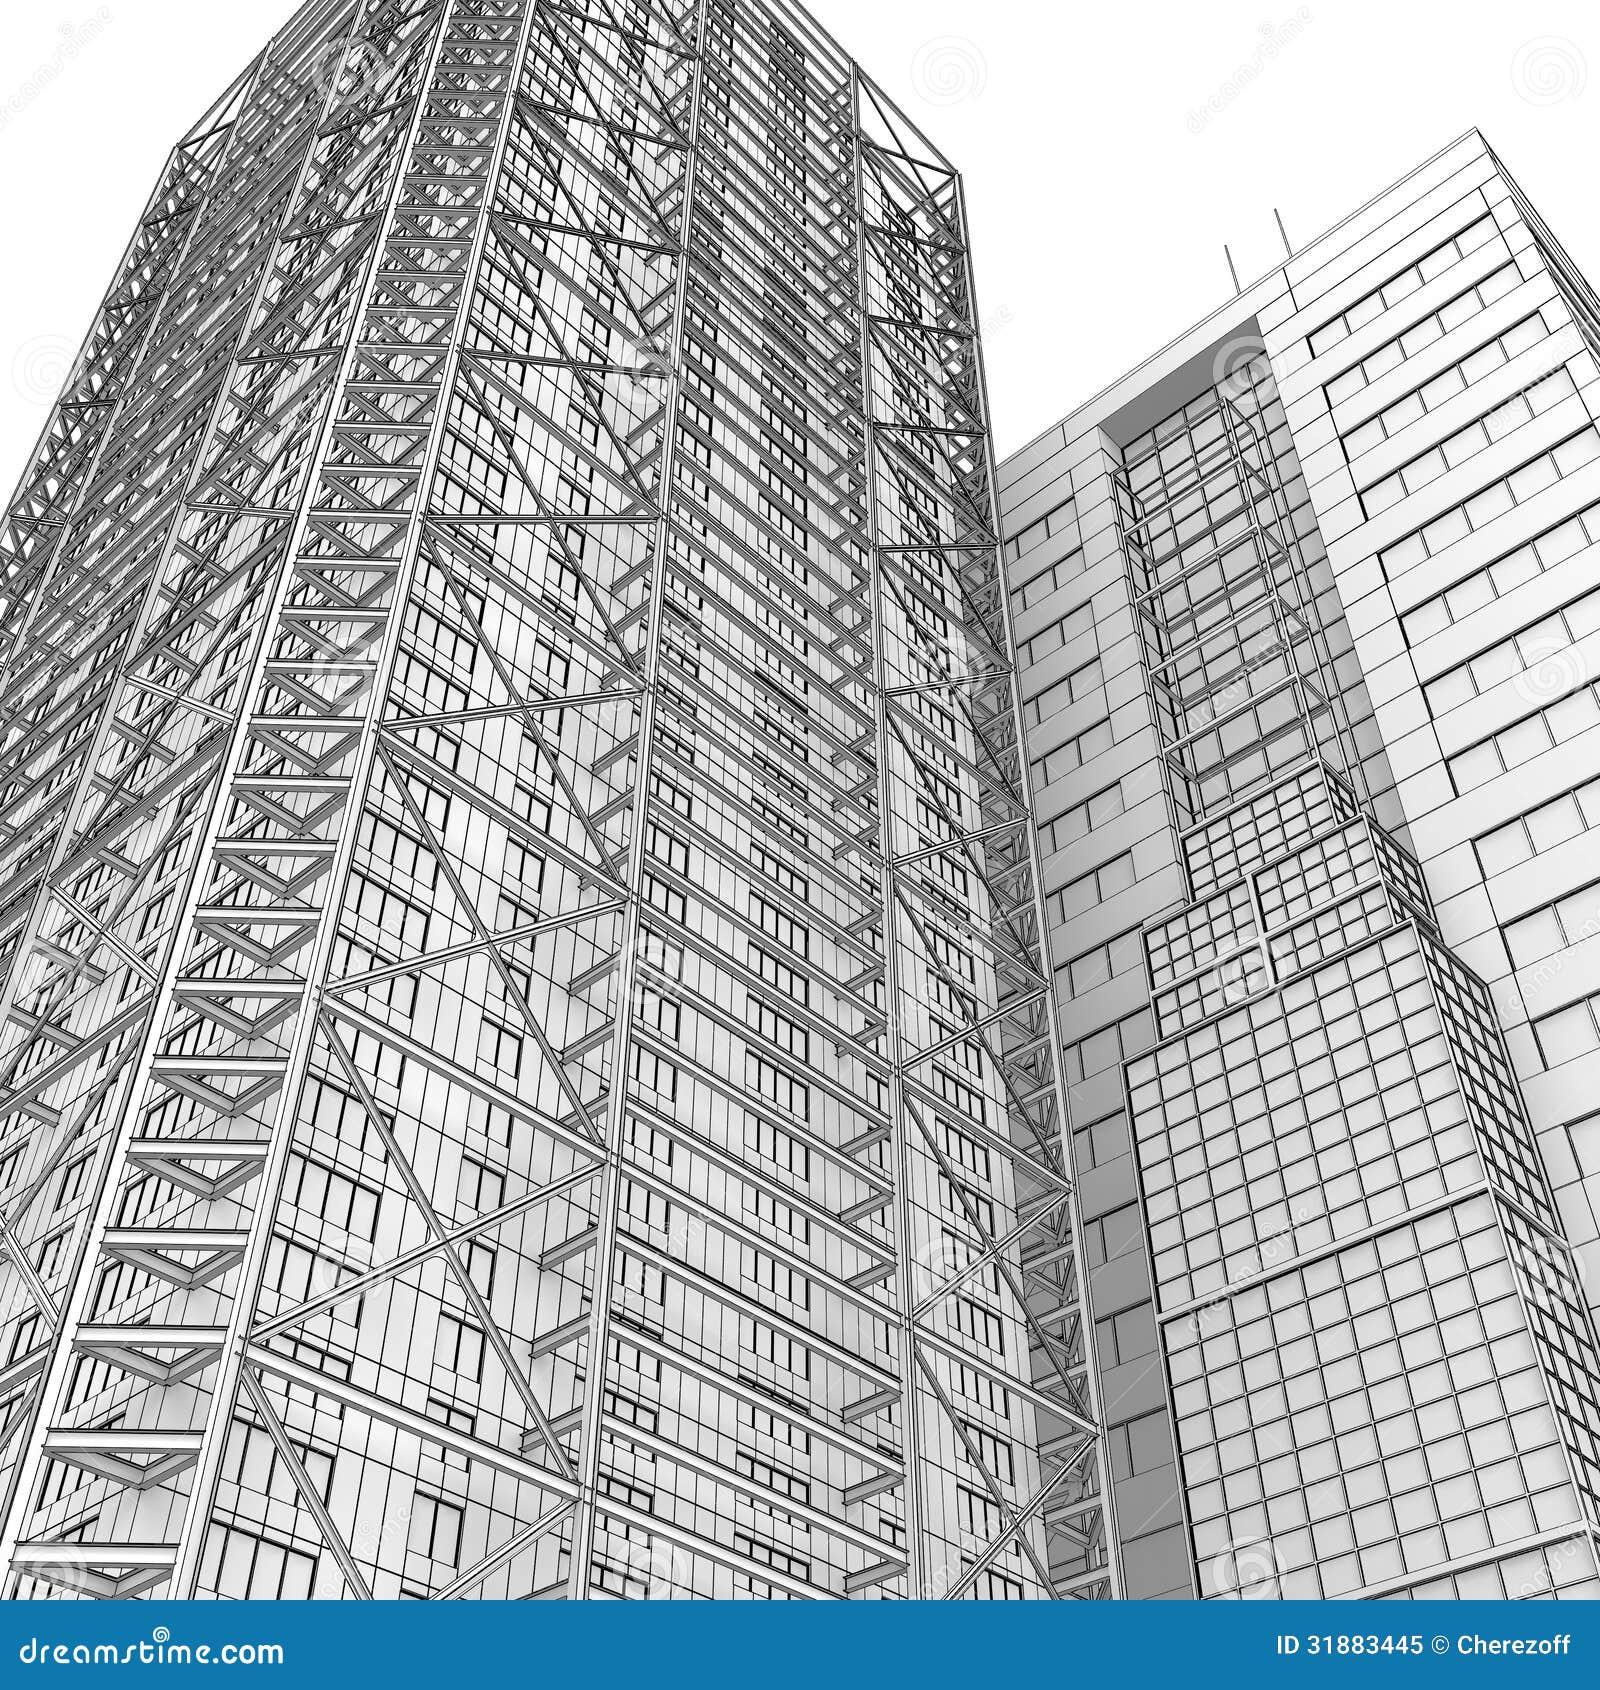 architecture blueprints skyscraper. Royalty-Free Stock Photo Architecture Blueprints Skyscraper